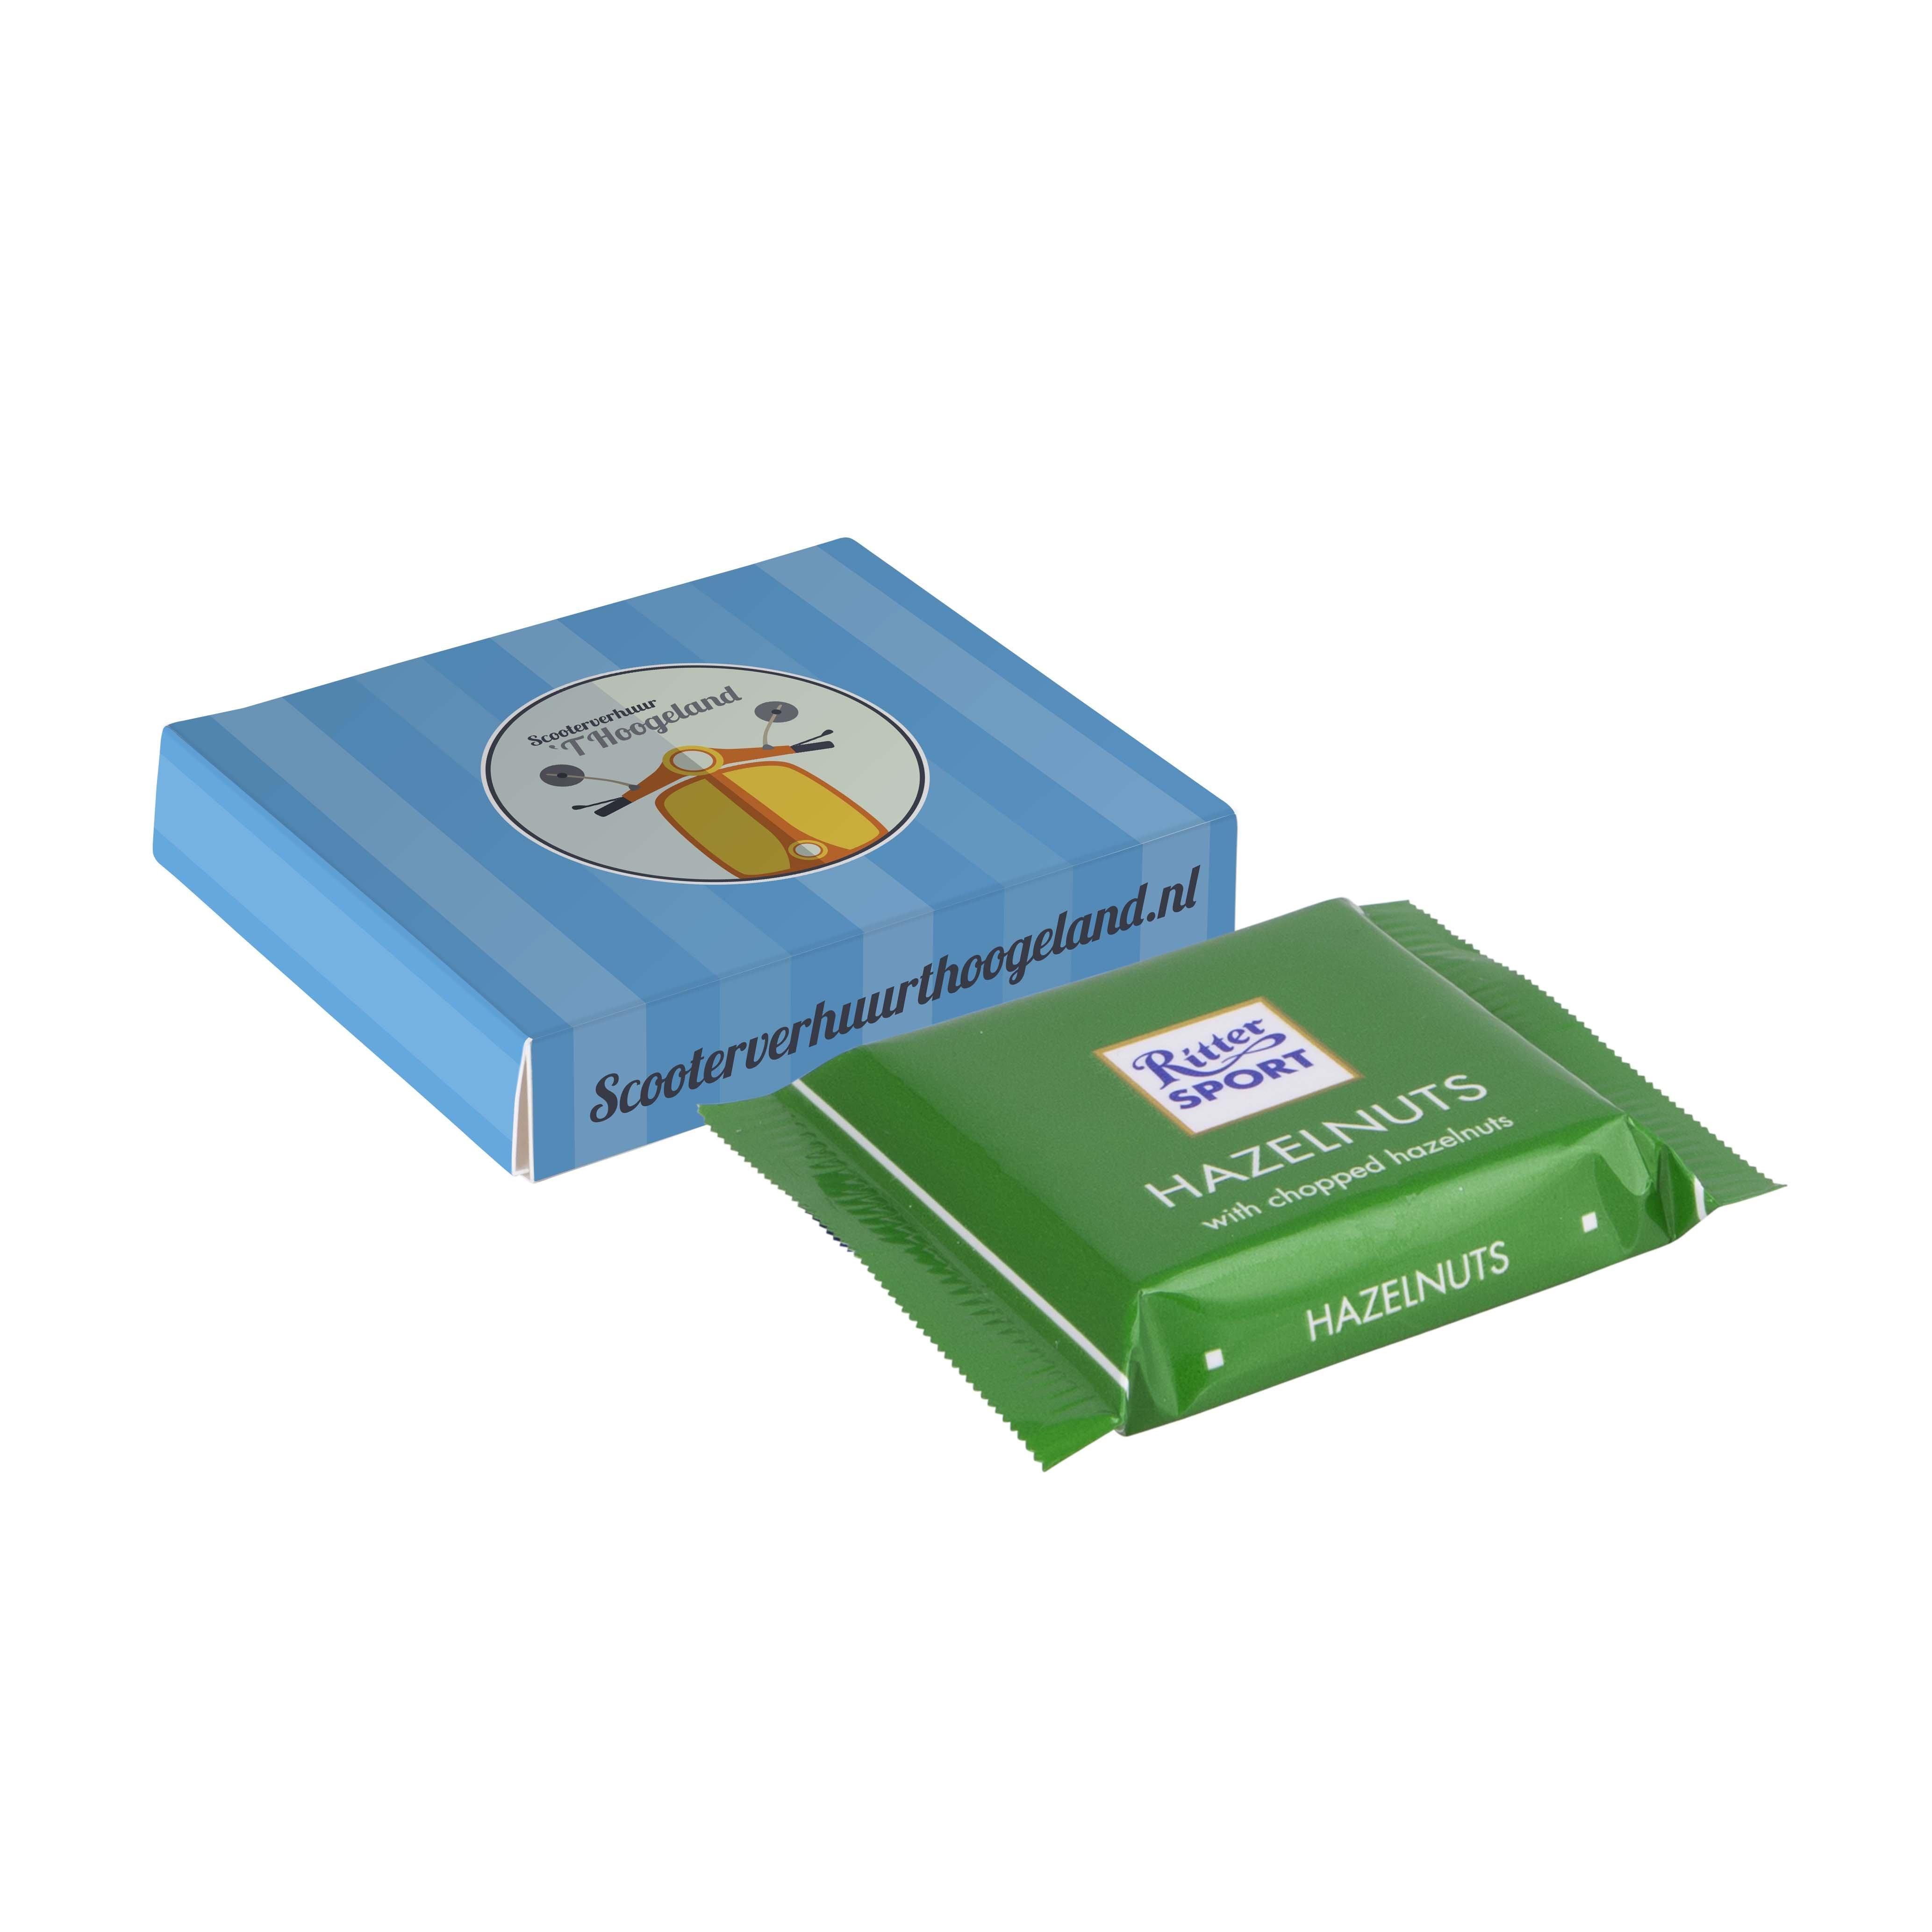 Ritter SPORT mini packaging